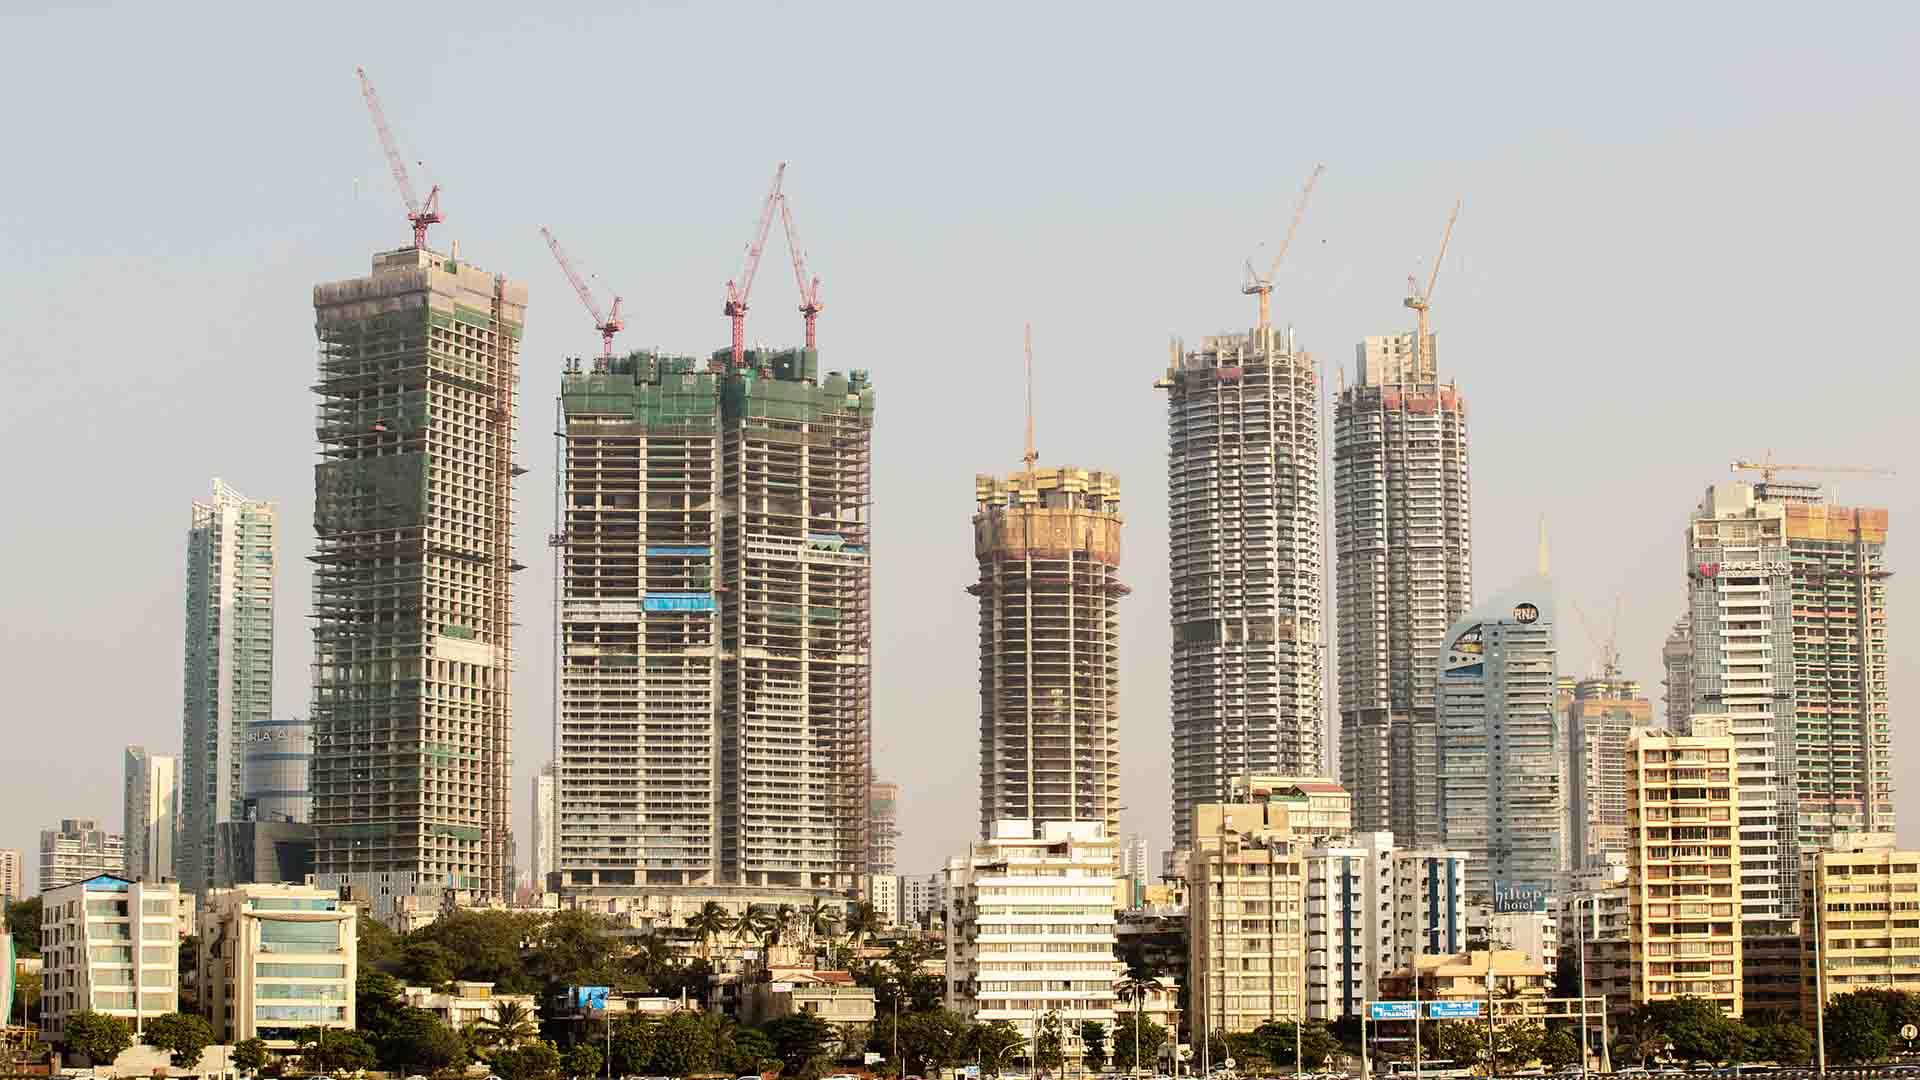 Mumbai Development Set Up 2034 Receives Government's NOD